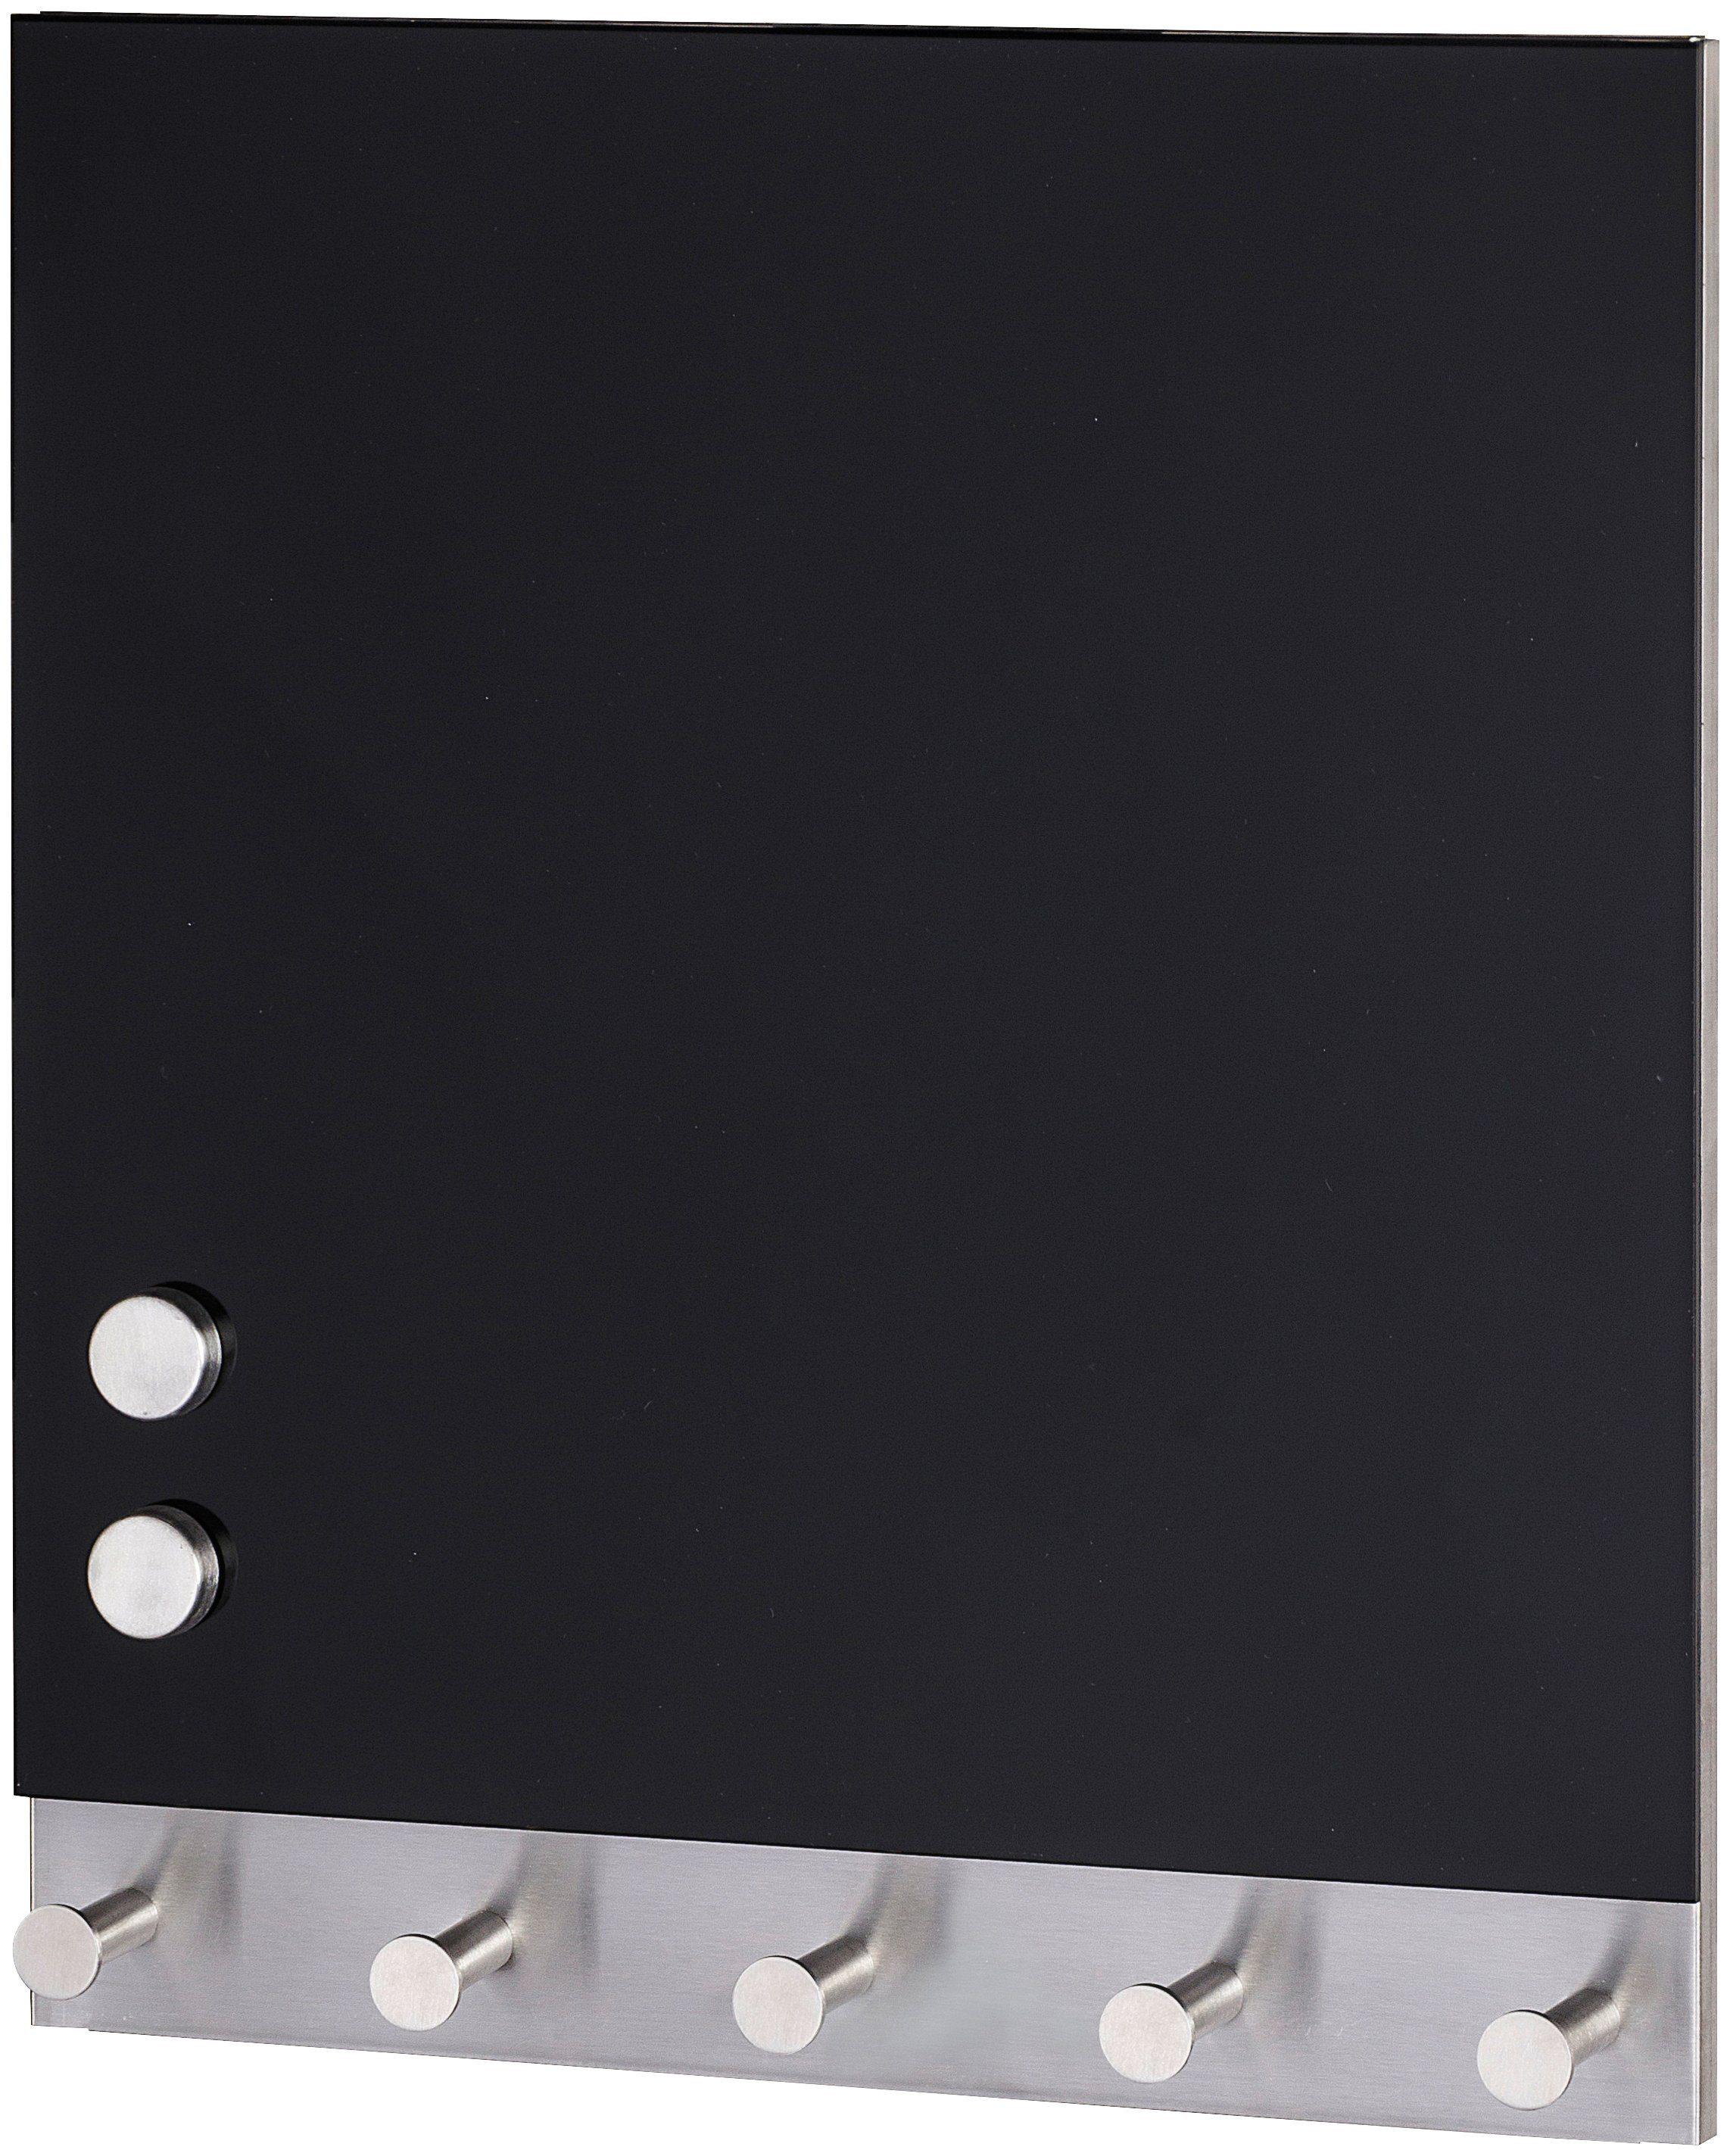 WENKO Garderobenhaken »Magnetische Garderobe Black«, 5 Haken, 30 x 34 cm